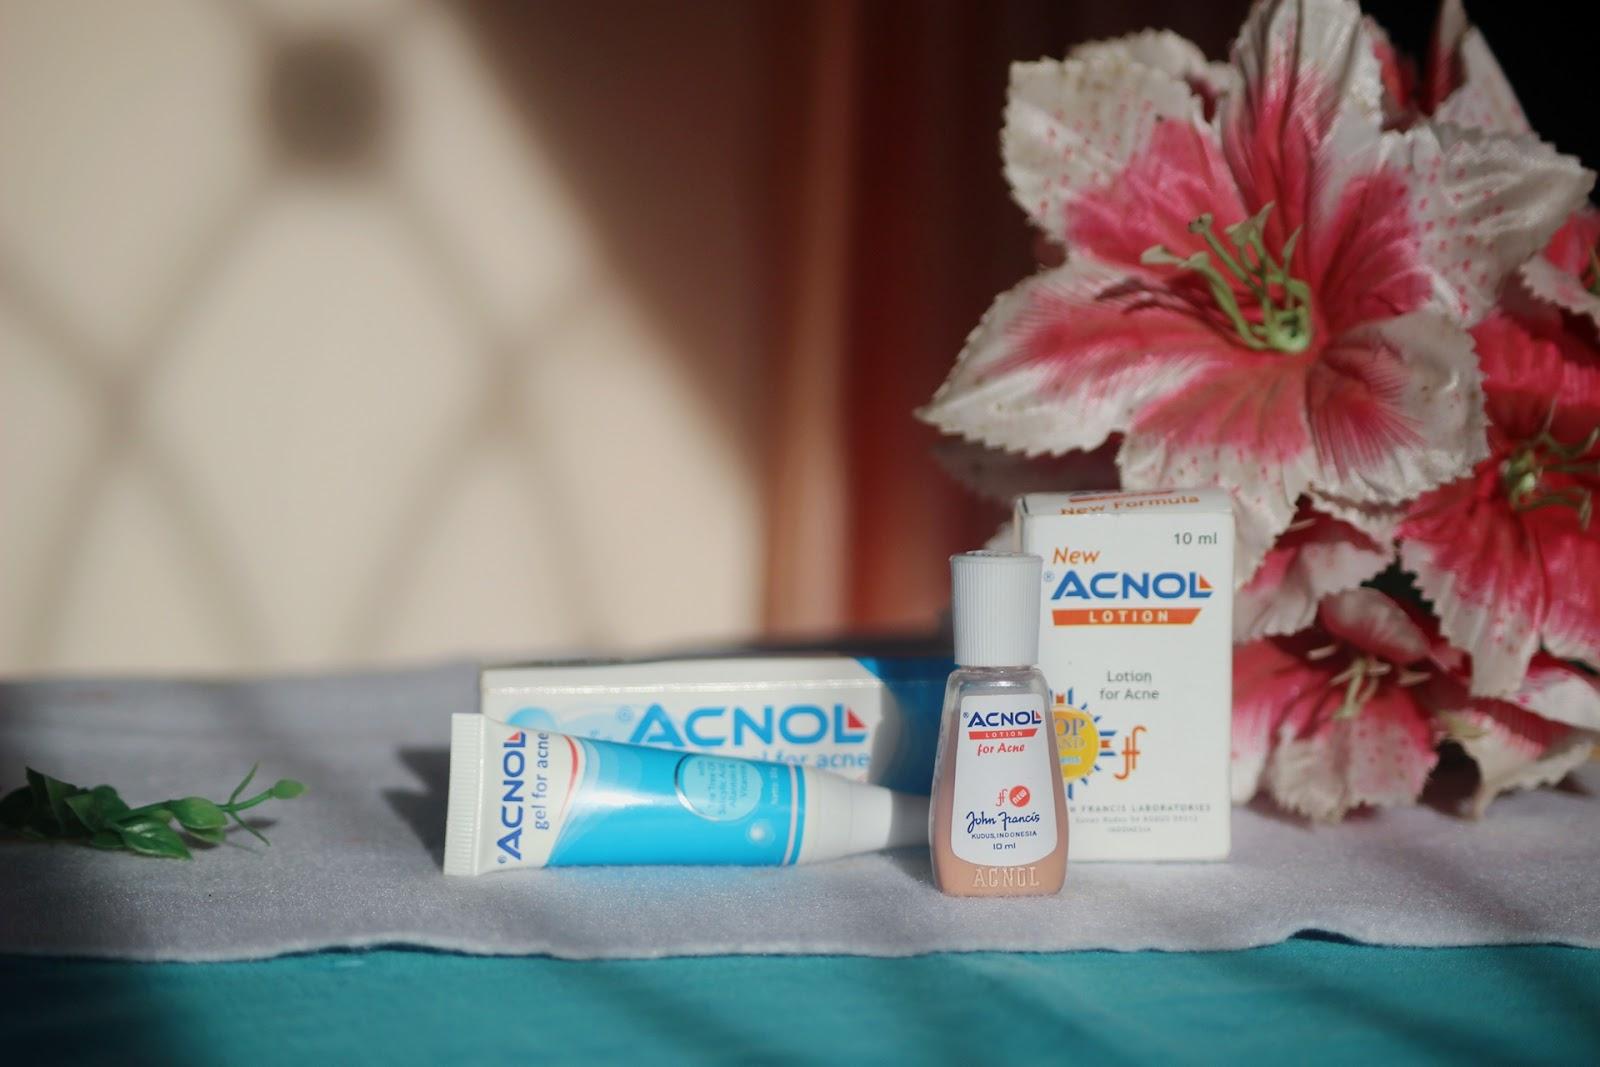 New Acnol Lotion 10 Ml For Acne Care Solutiion Acne & Blemish Treatments Health & Beauty